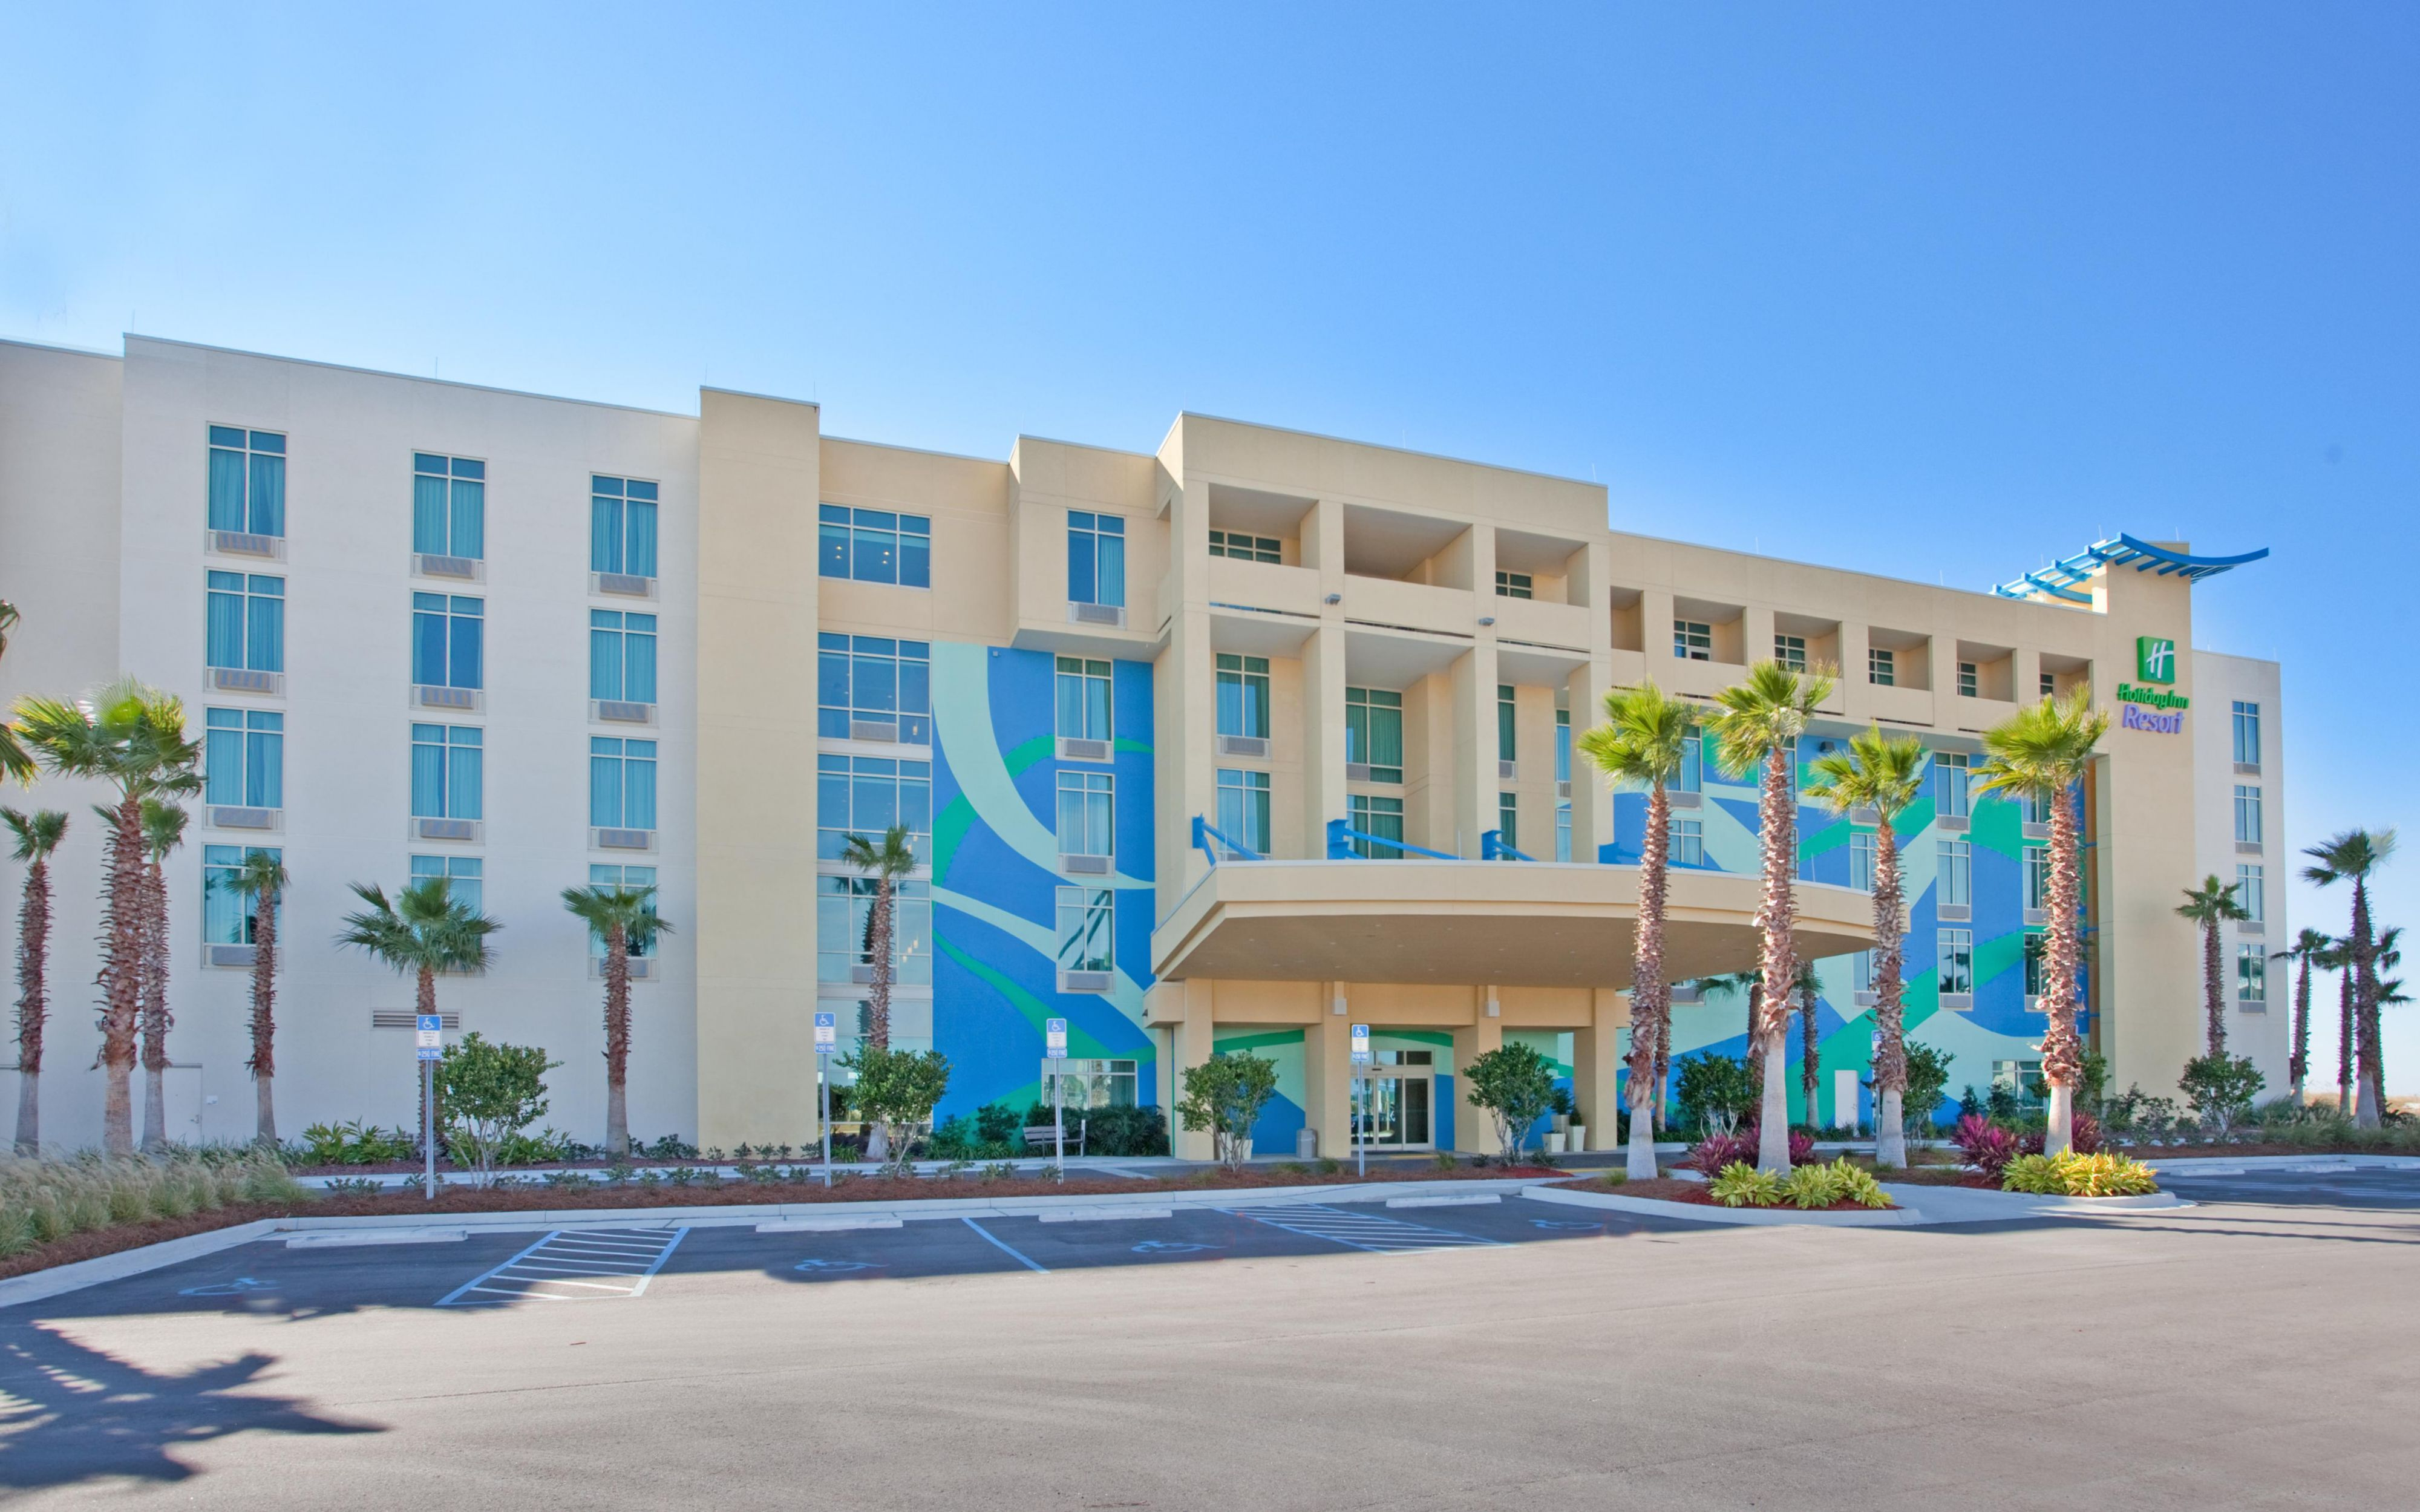 Holiday Inn Resort Fort Walton Beach At 1299 Miracle Strip Parkway Fort Walton Beach Fl On Fave